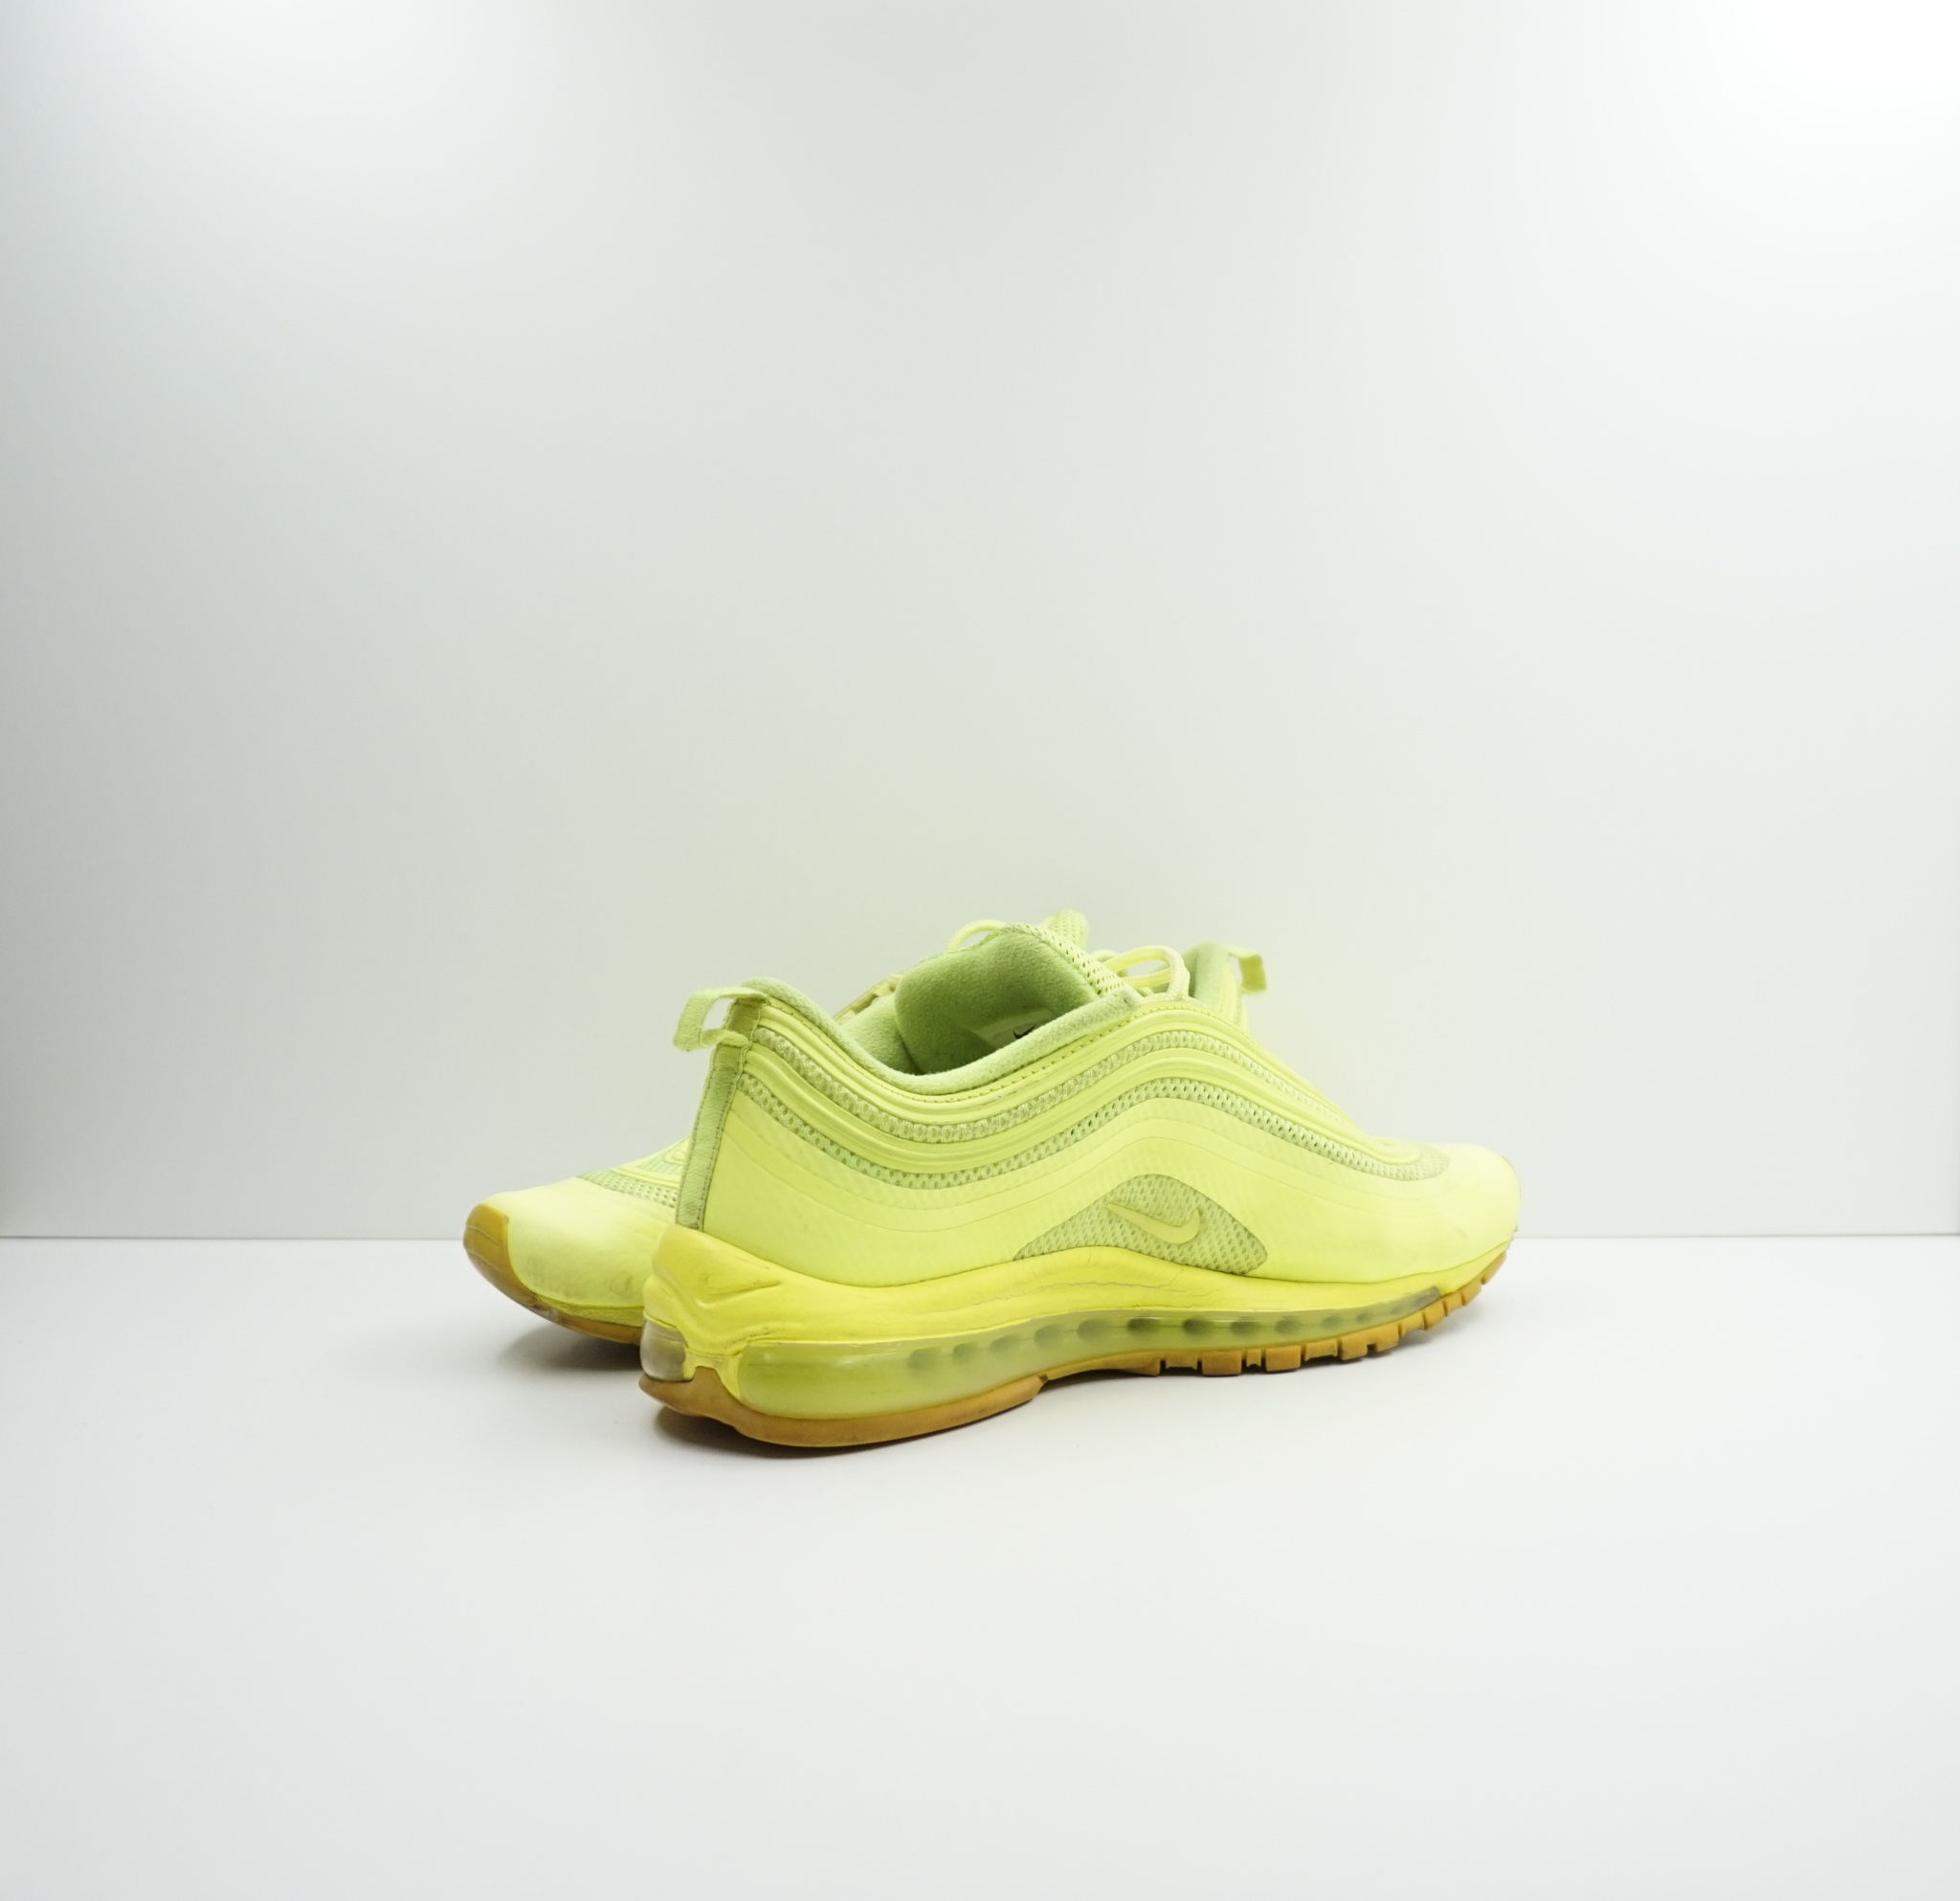 Nike Air Max 97 Hyperfuse Volt